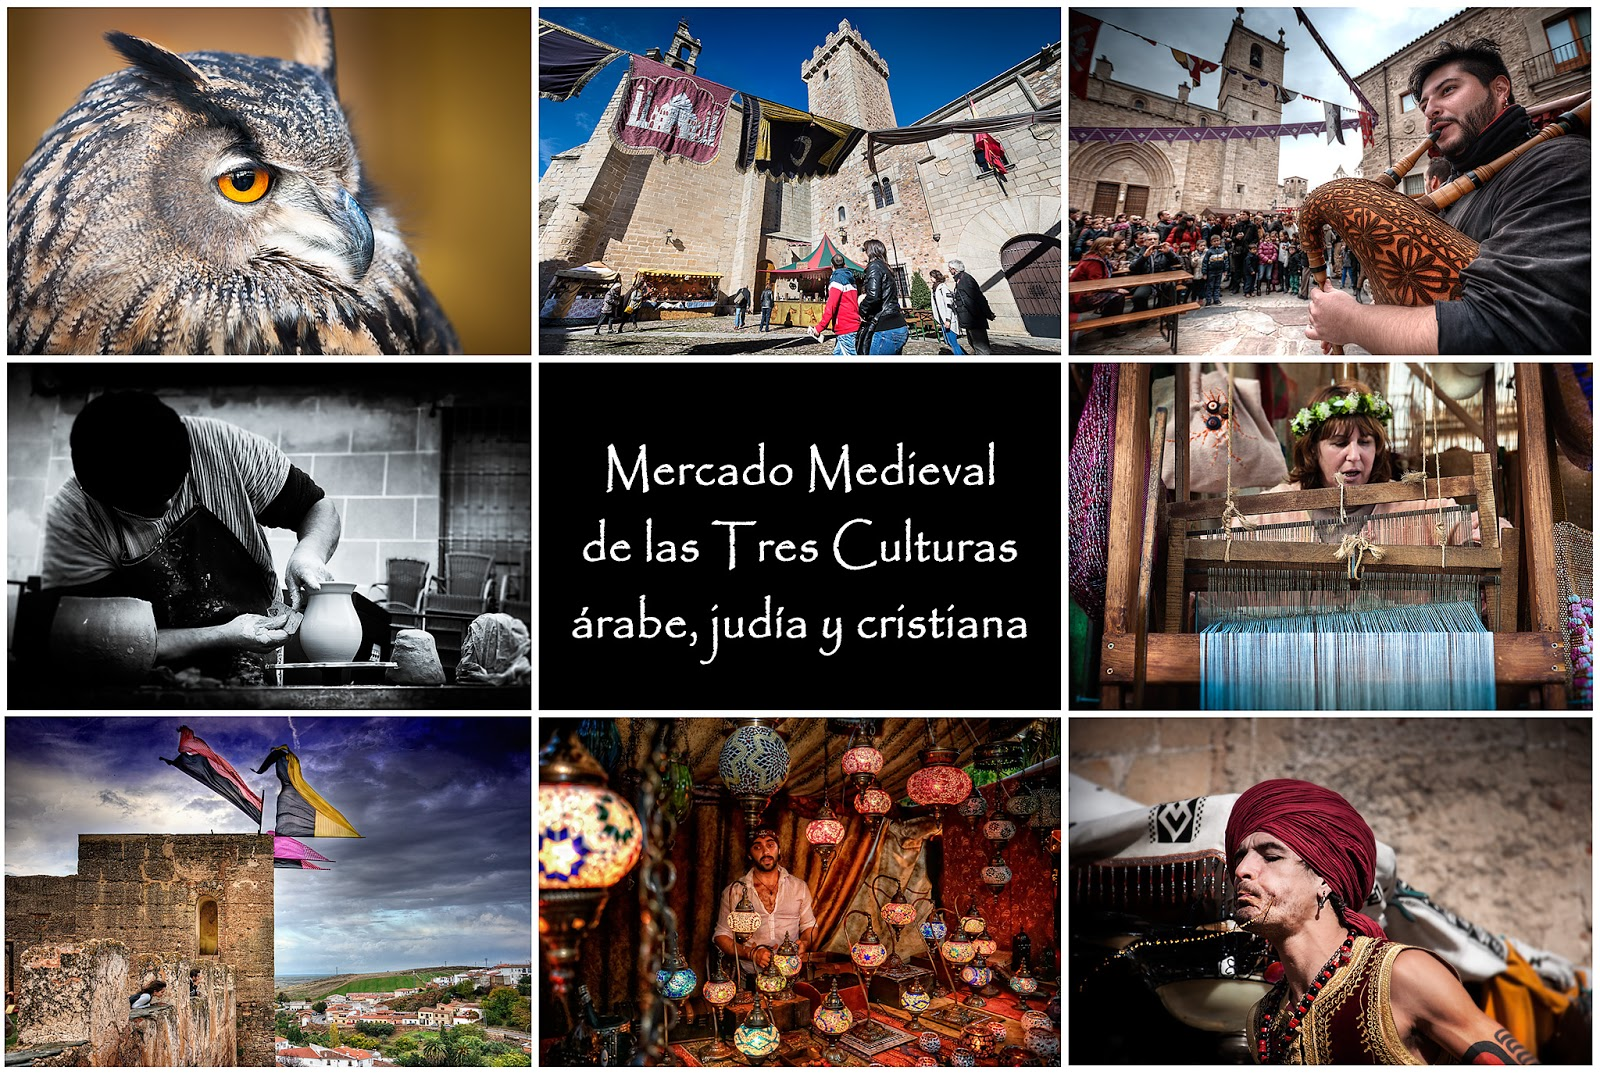 Mercado Medieval Tres Culturas Cáceres